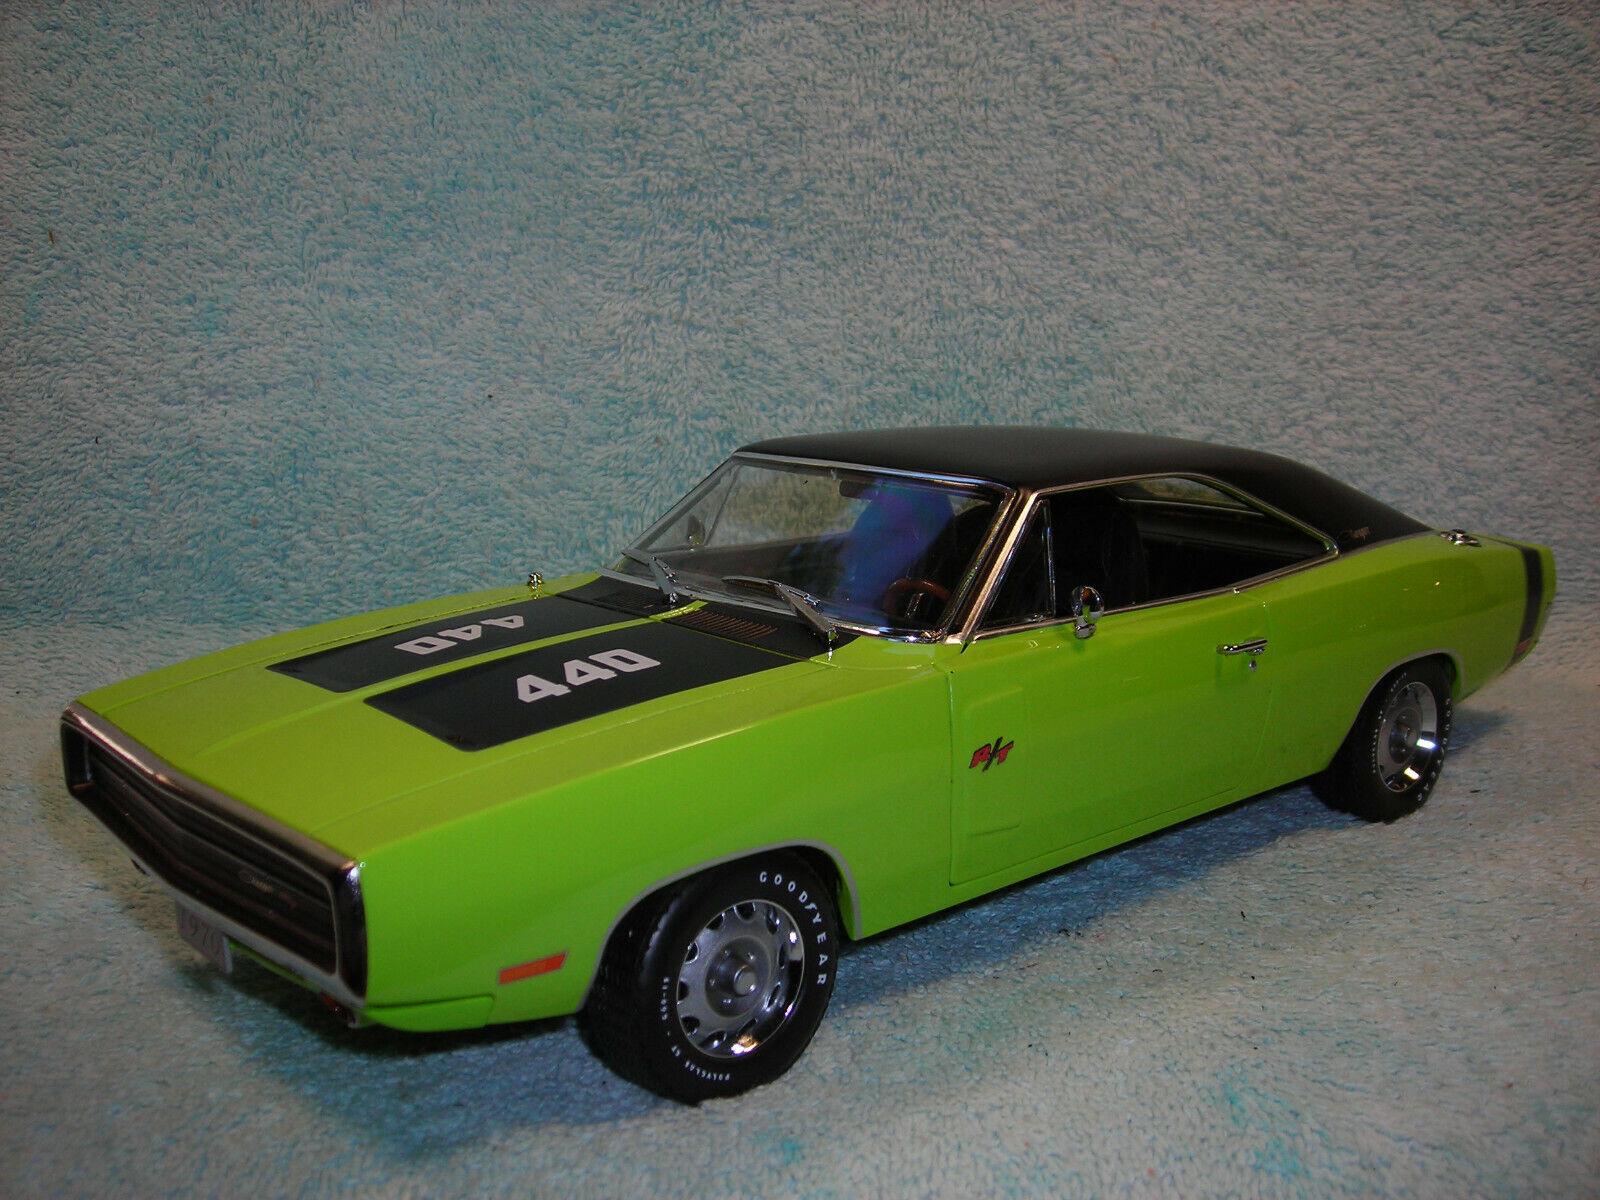 Diecast Escala 1 18 1970 Dodge Cochegador RT se En verde Lima Negro por luz verde.